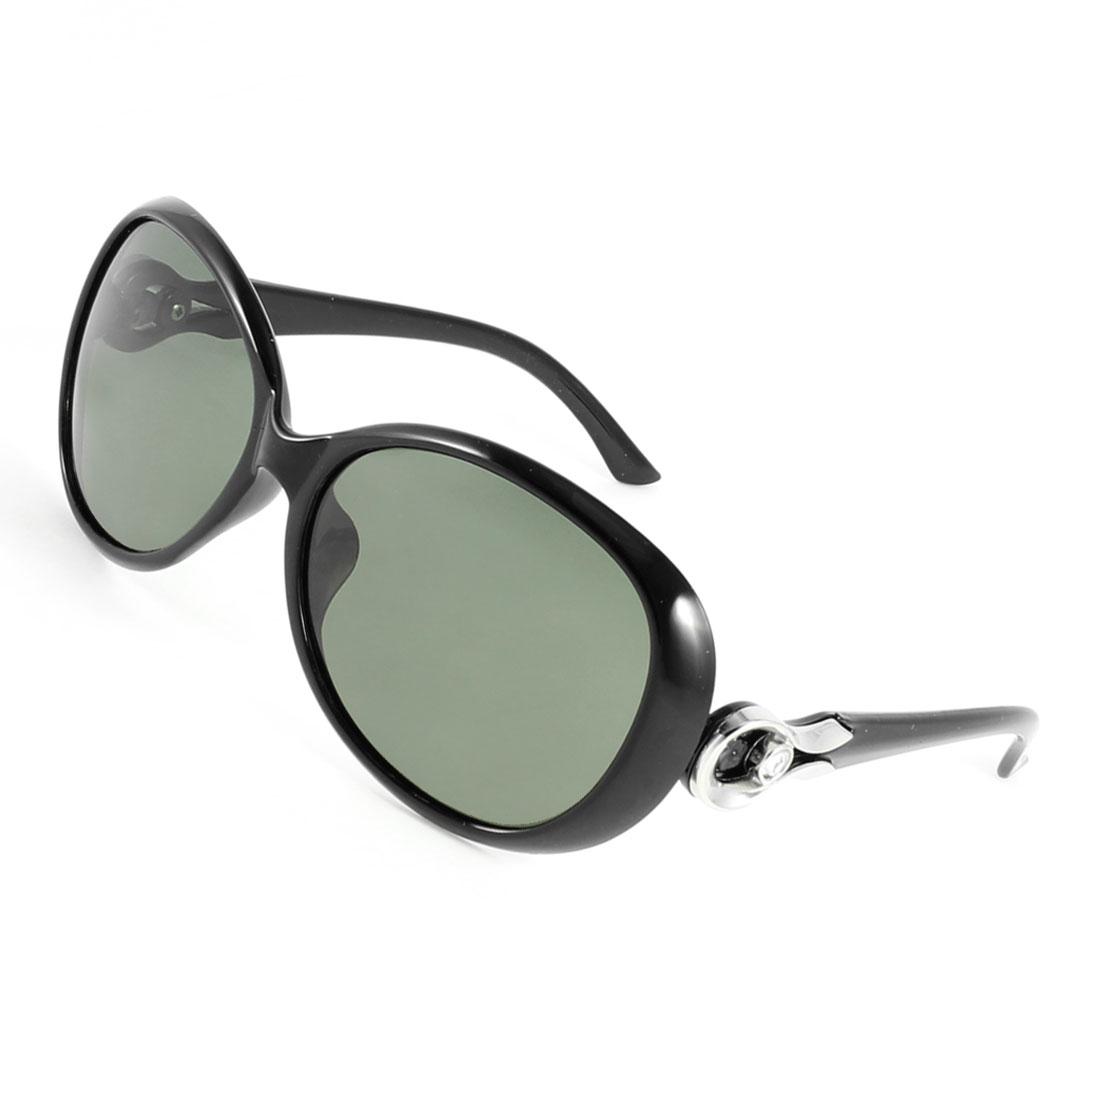 Black Plastic Rhinestone Detail Arm Teardrop Lens Polarized Sunglasses for Lady